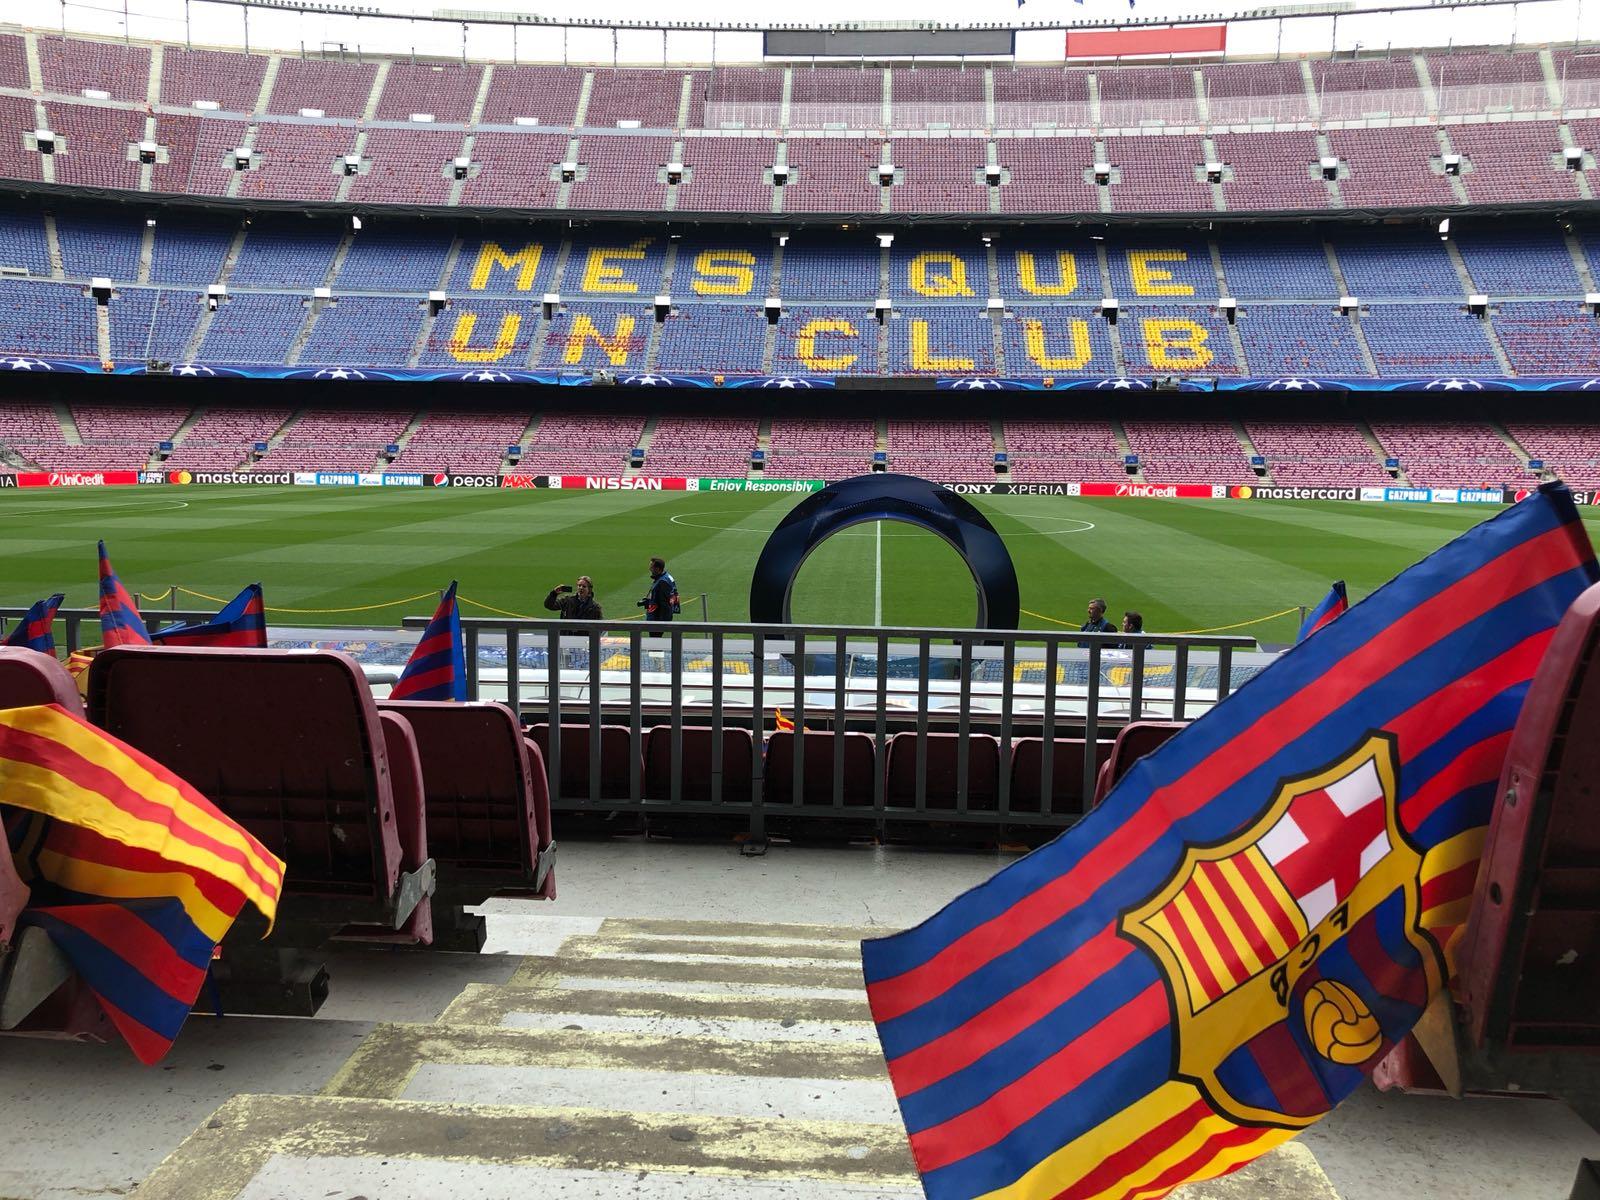 �� #BarçaChelsea ���� https://t.co/VGvTm2LJOn